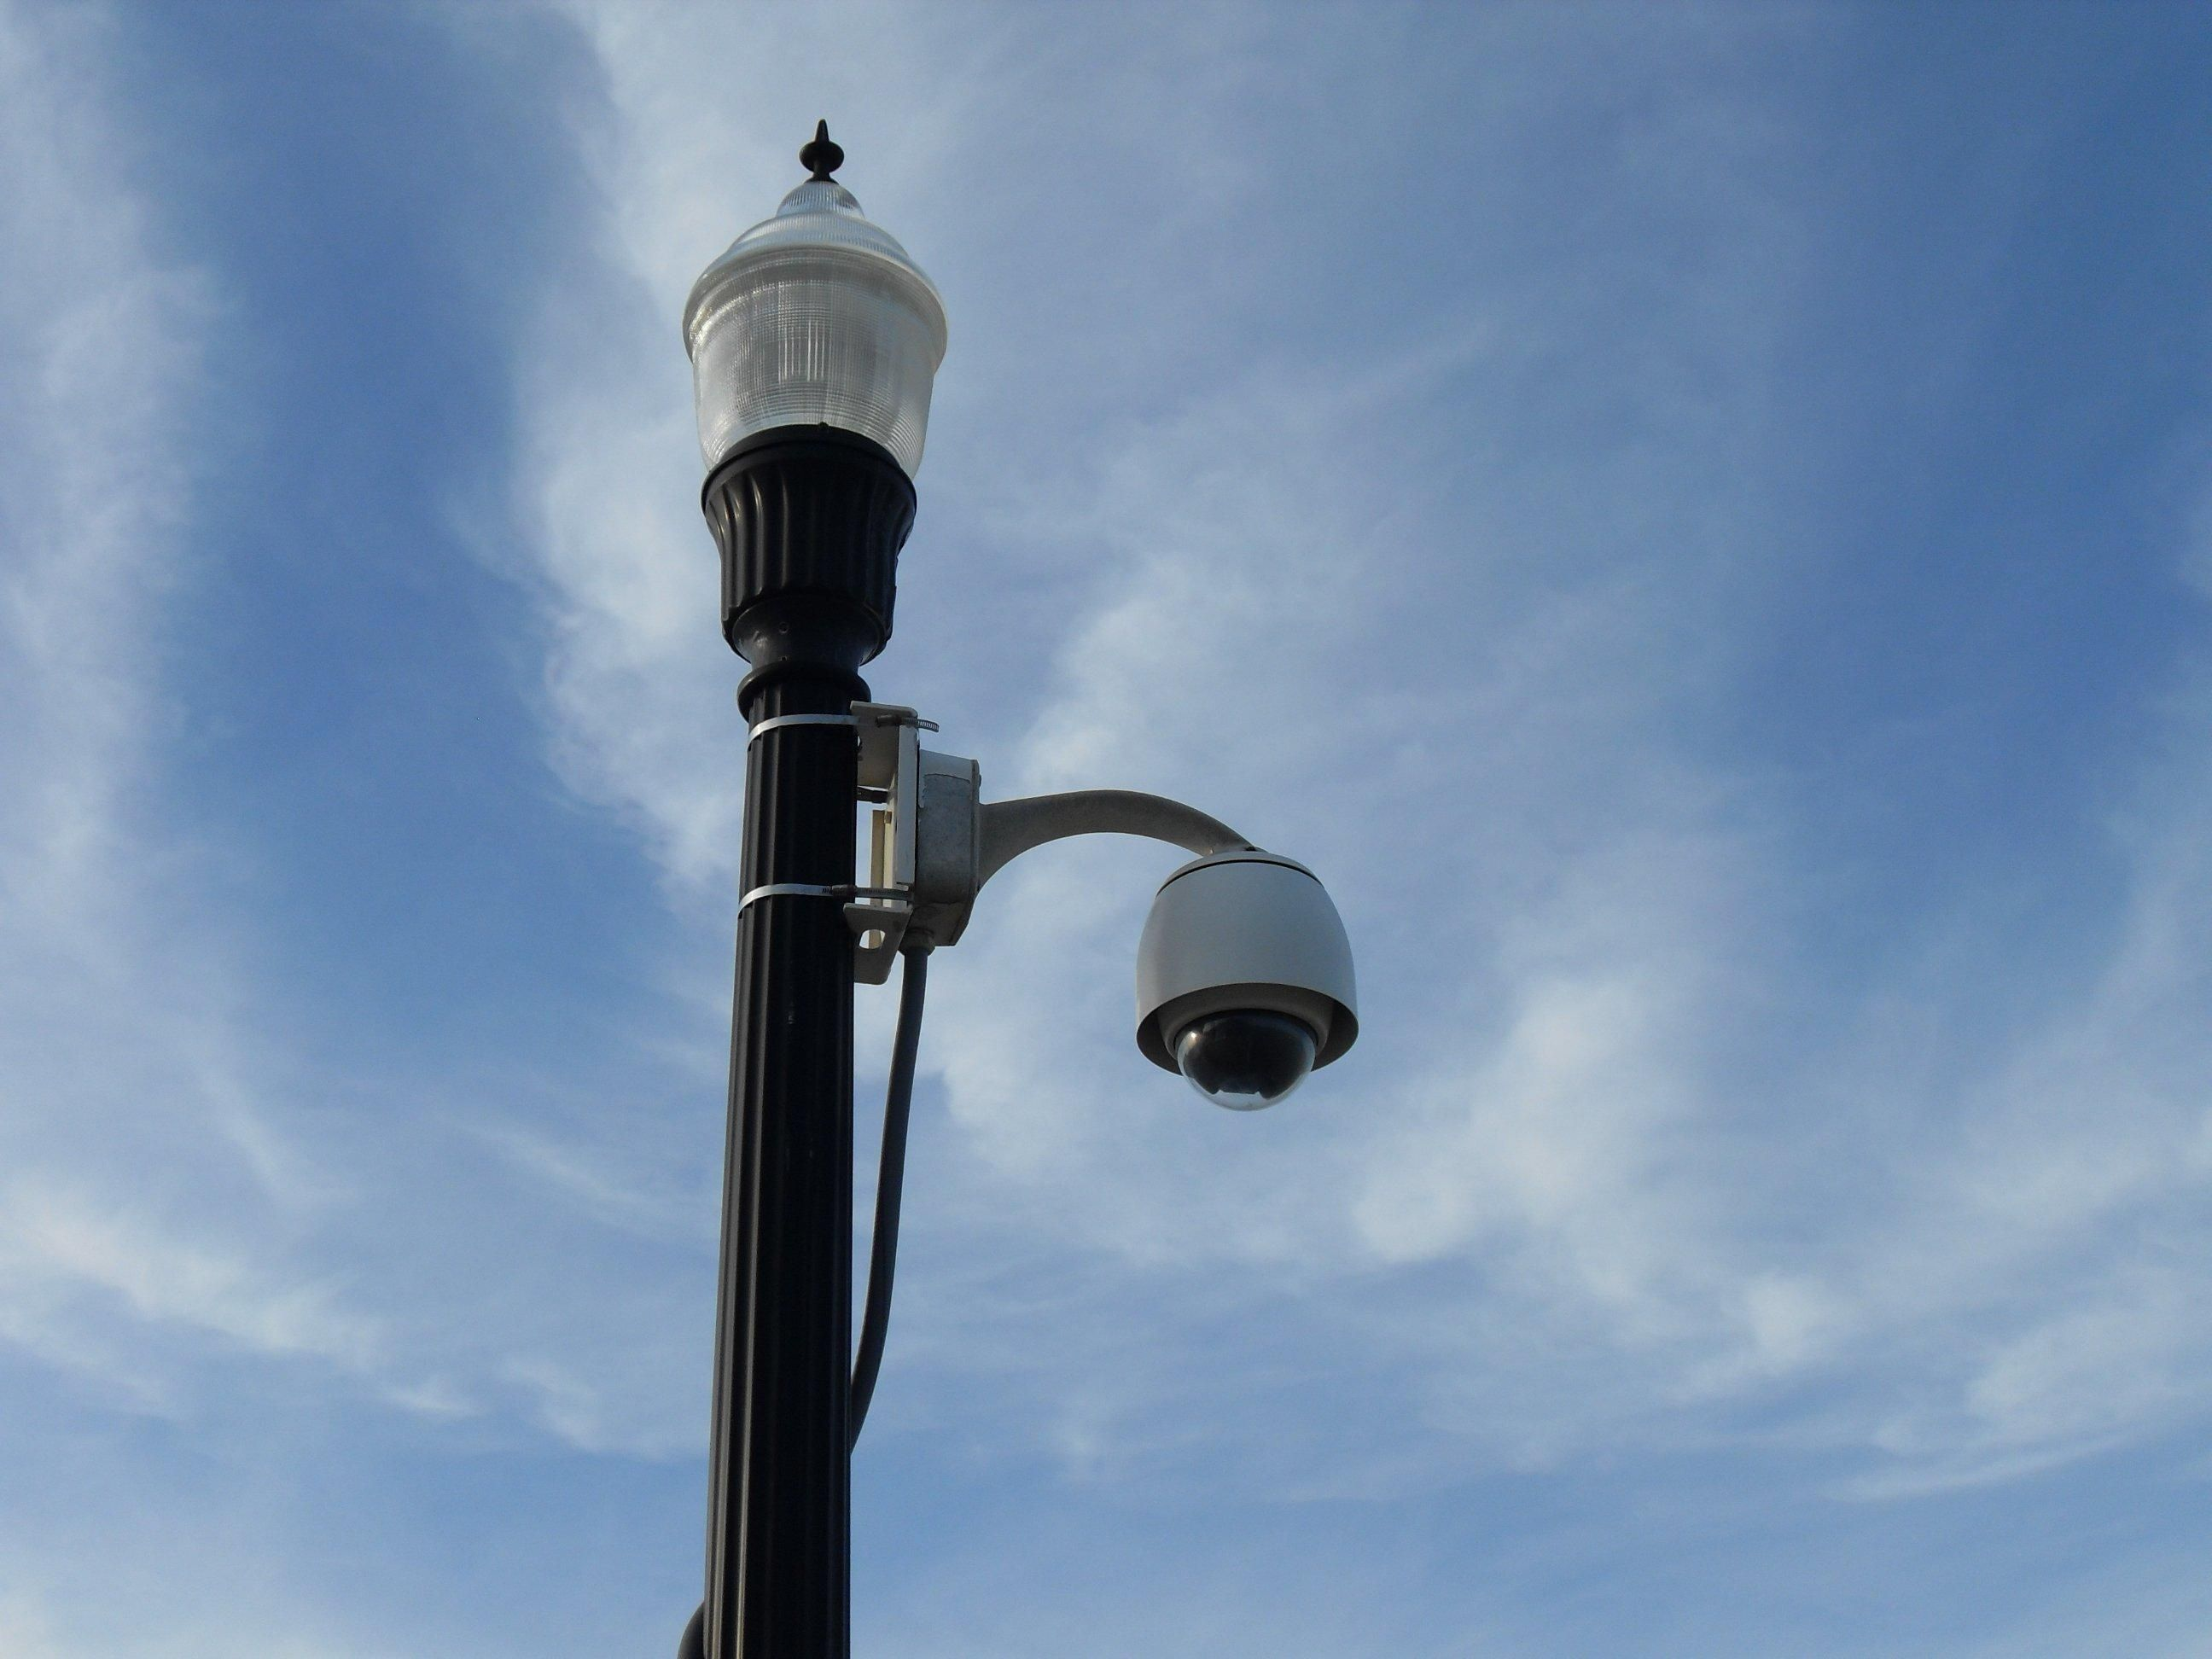 File:Antique Street Lamp Iron Lamp